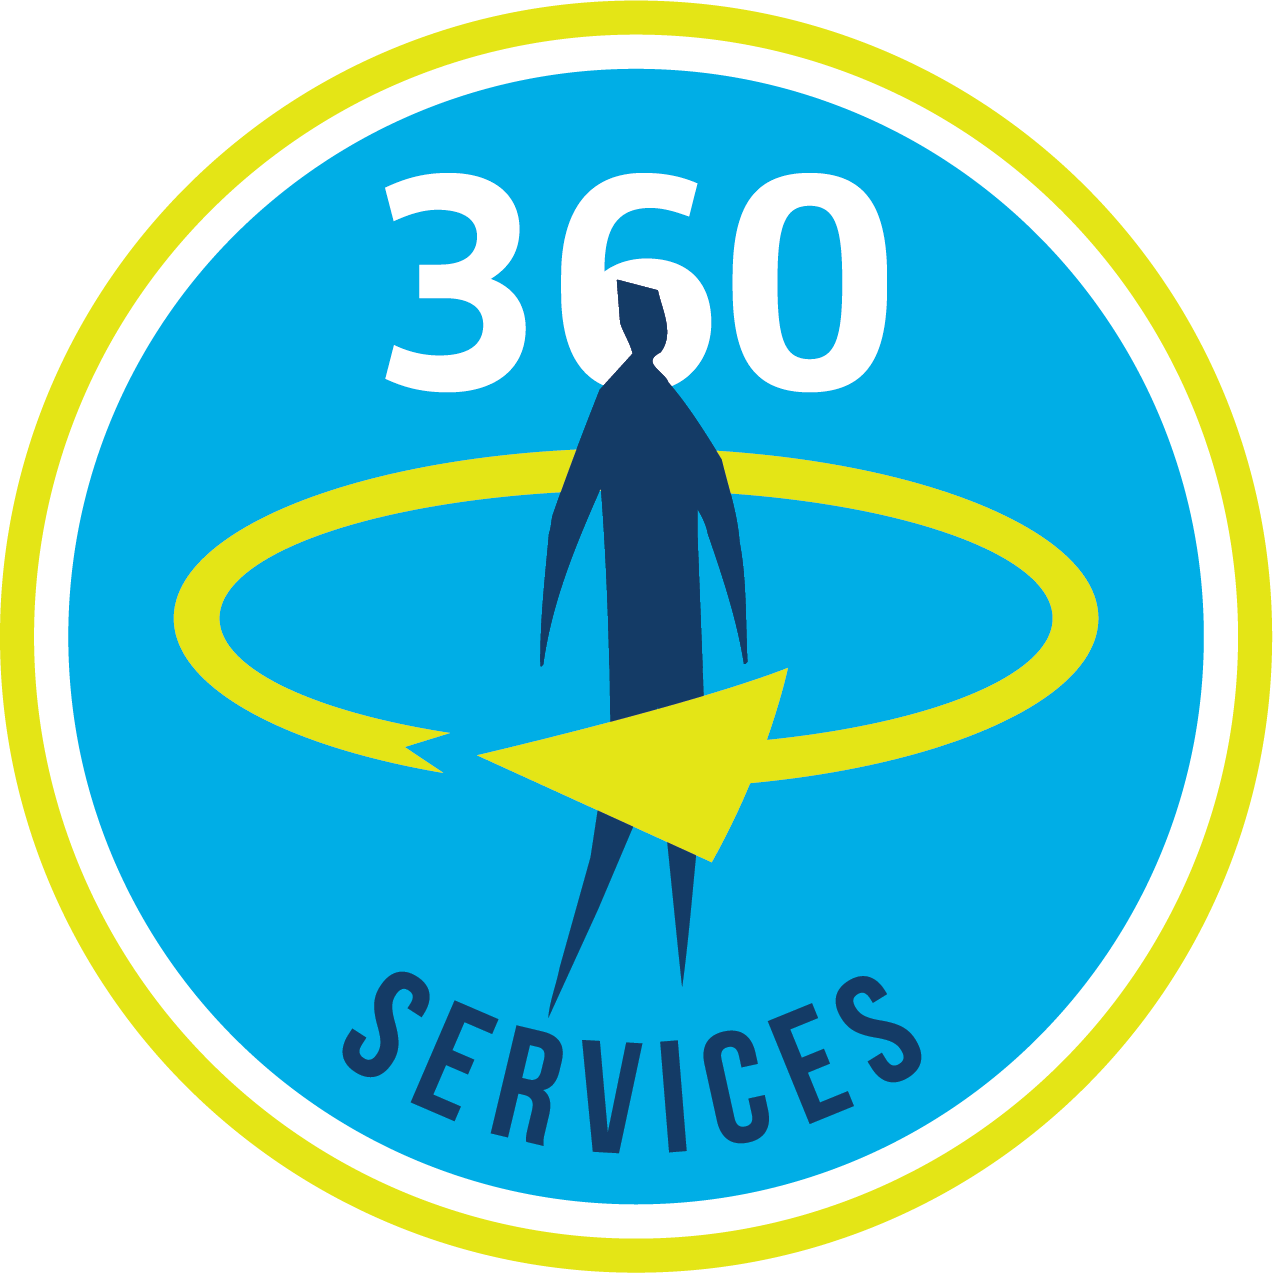 aclvb-universele_diensten-logo-cmyk_ok_fr_3.png